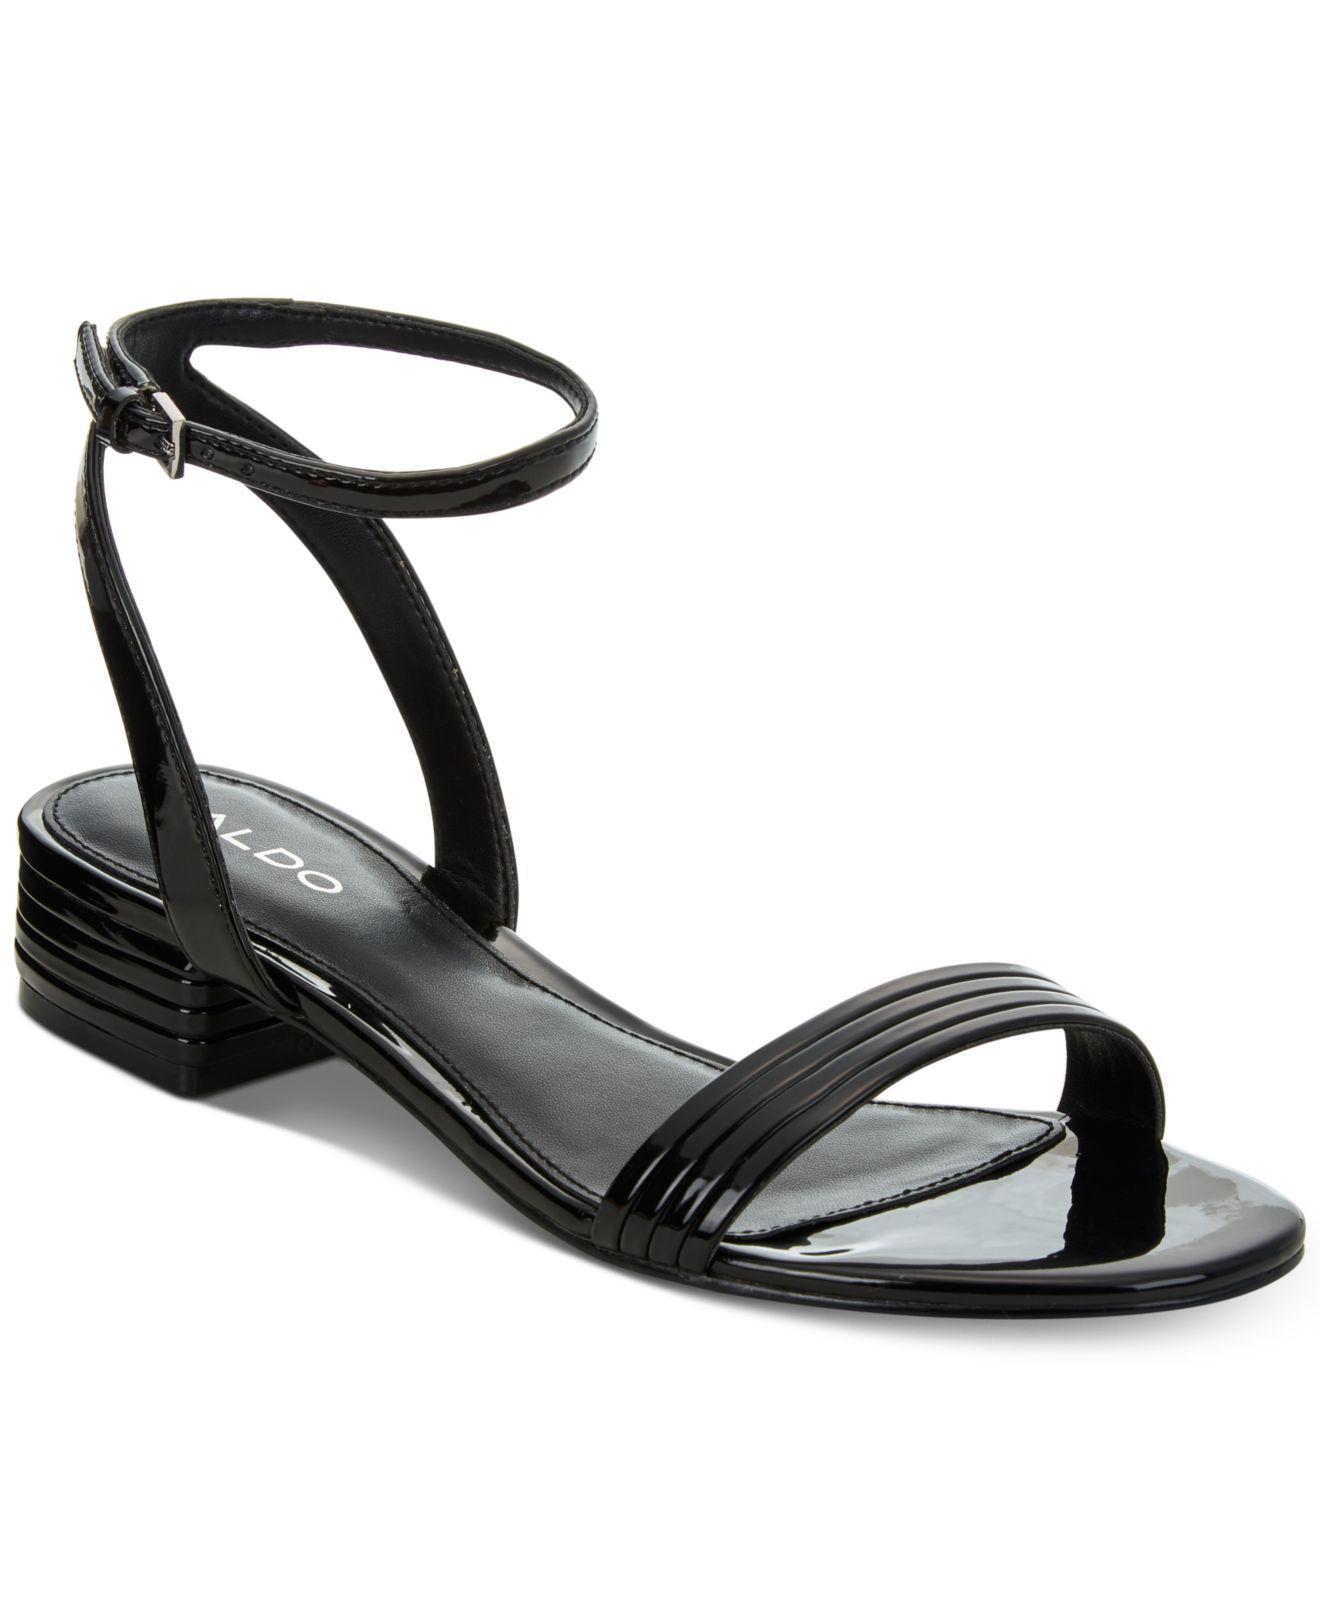 cd9328c10c8a Lyst - ALDO Izzie Metallic Sandals in Black